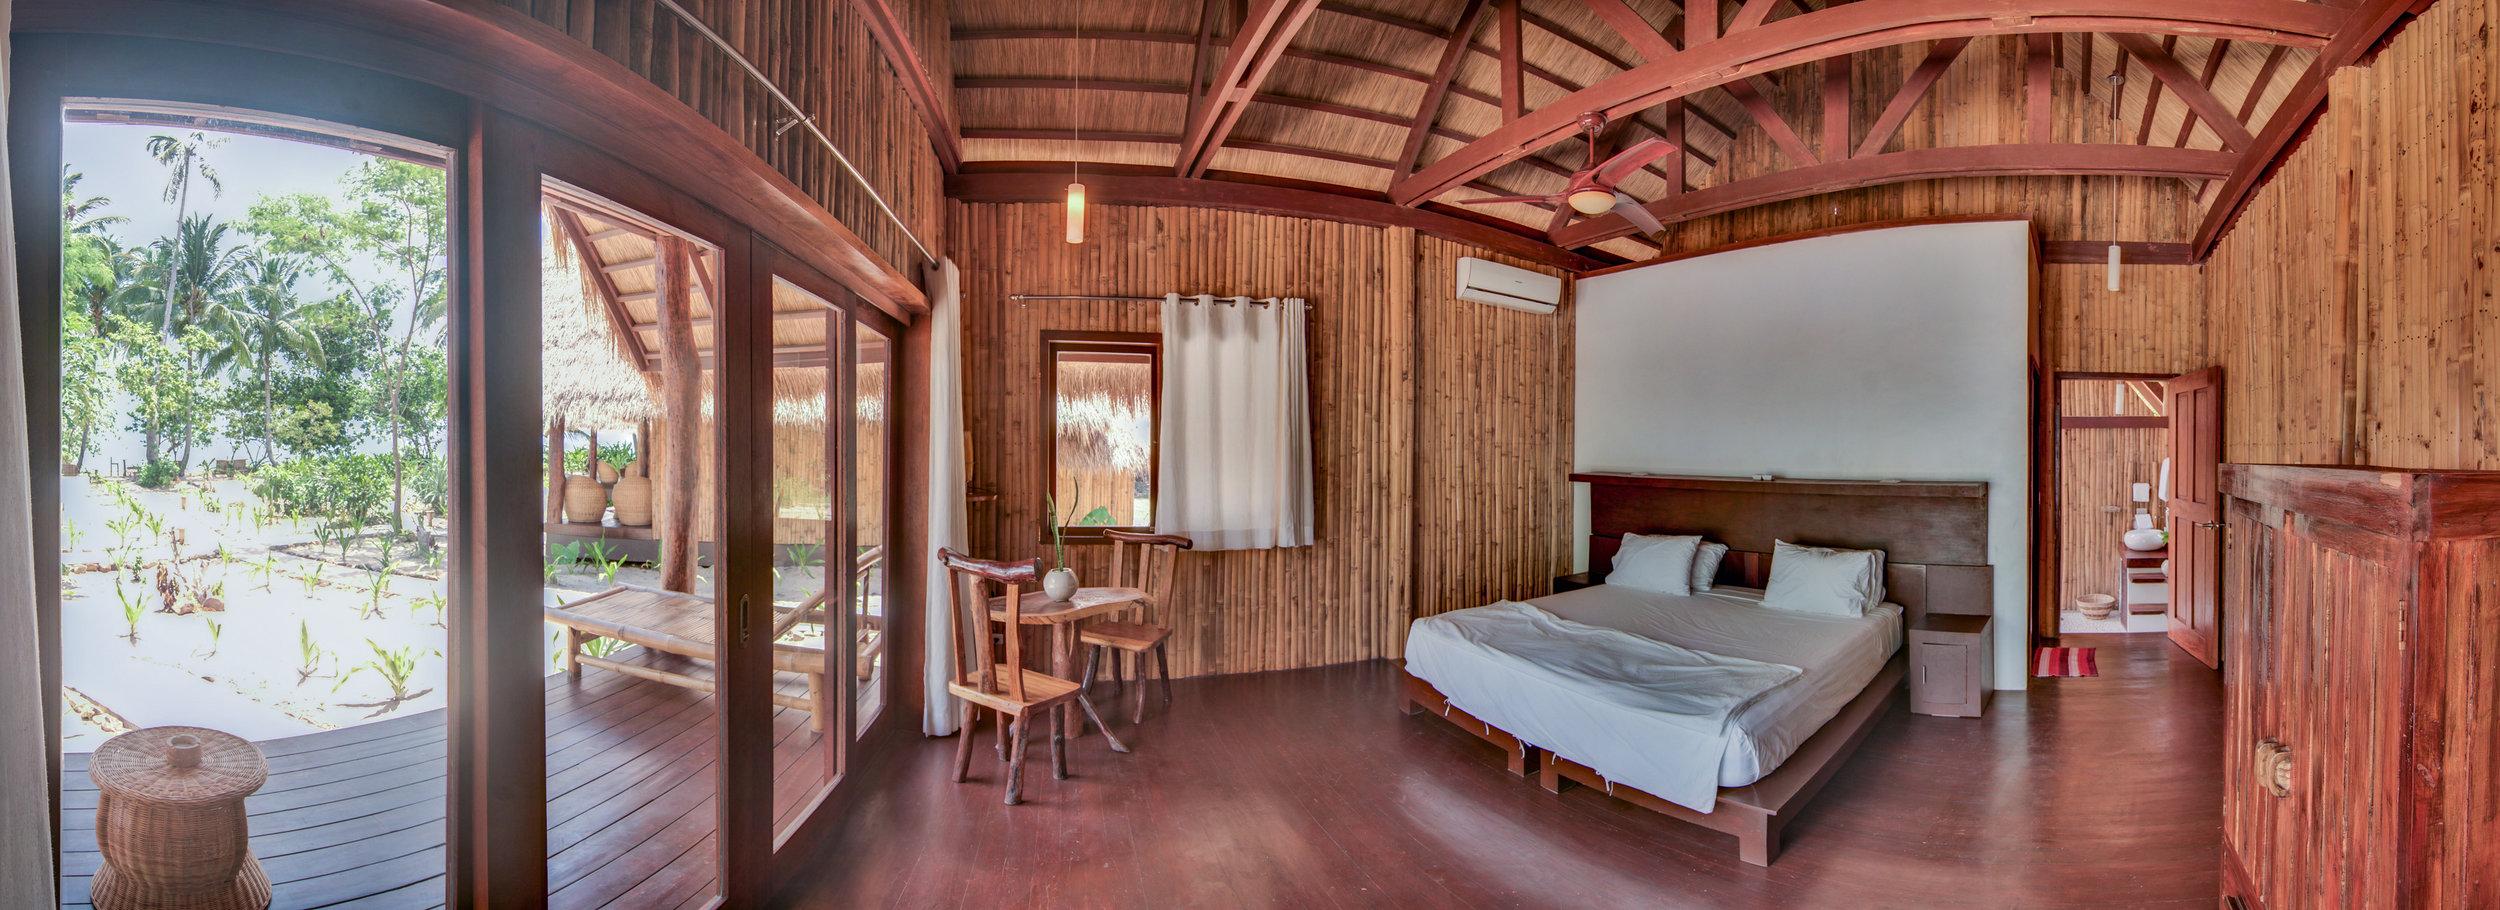 your luxury yoga retreat in Palawan